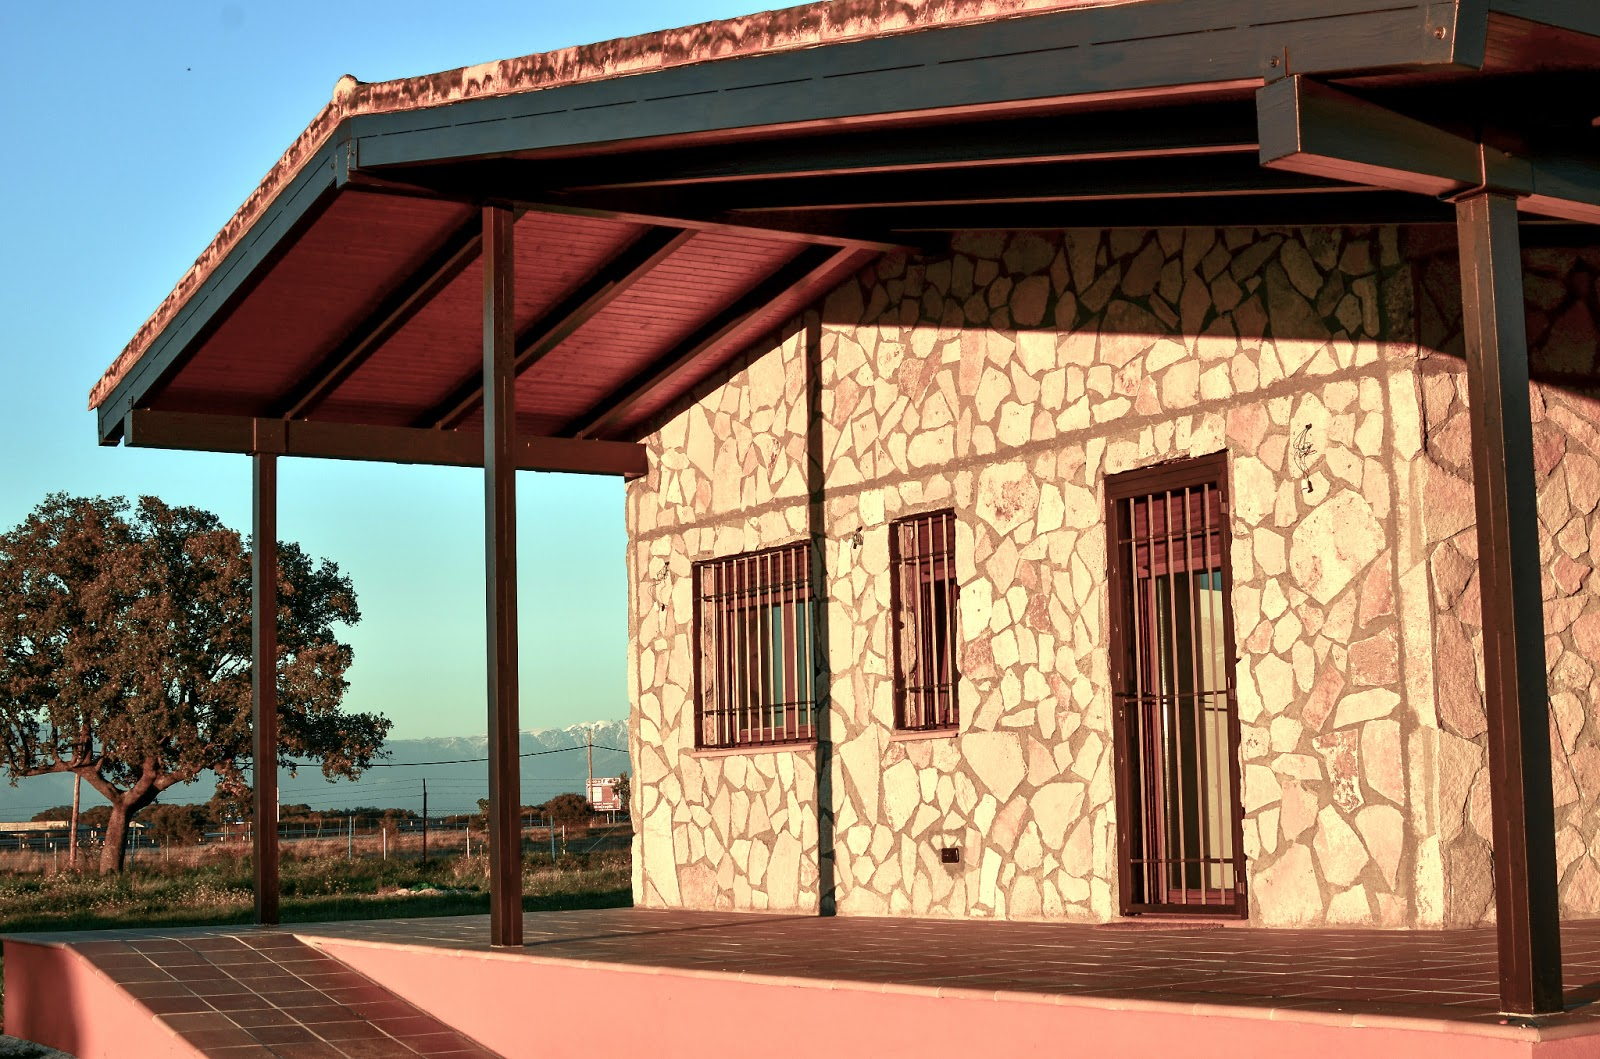 Casas prefabricadas madera casas de hormigon - Prefabricadas de hormigon ...